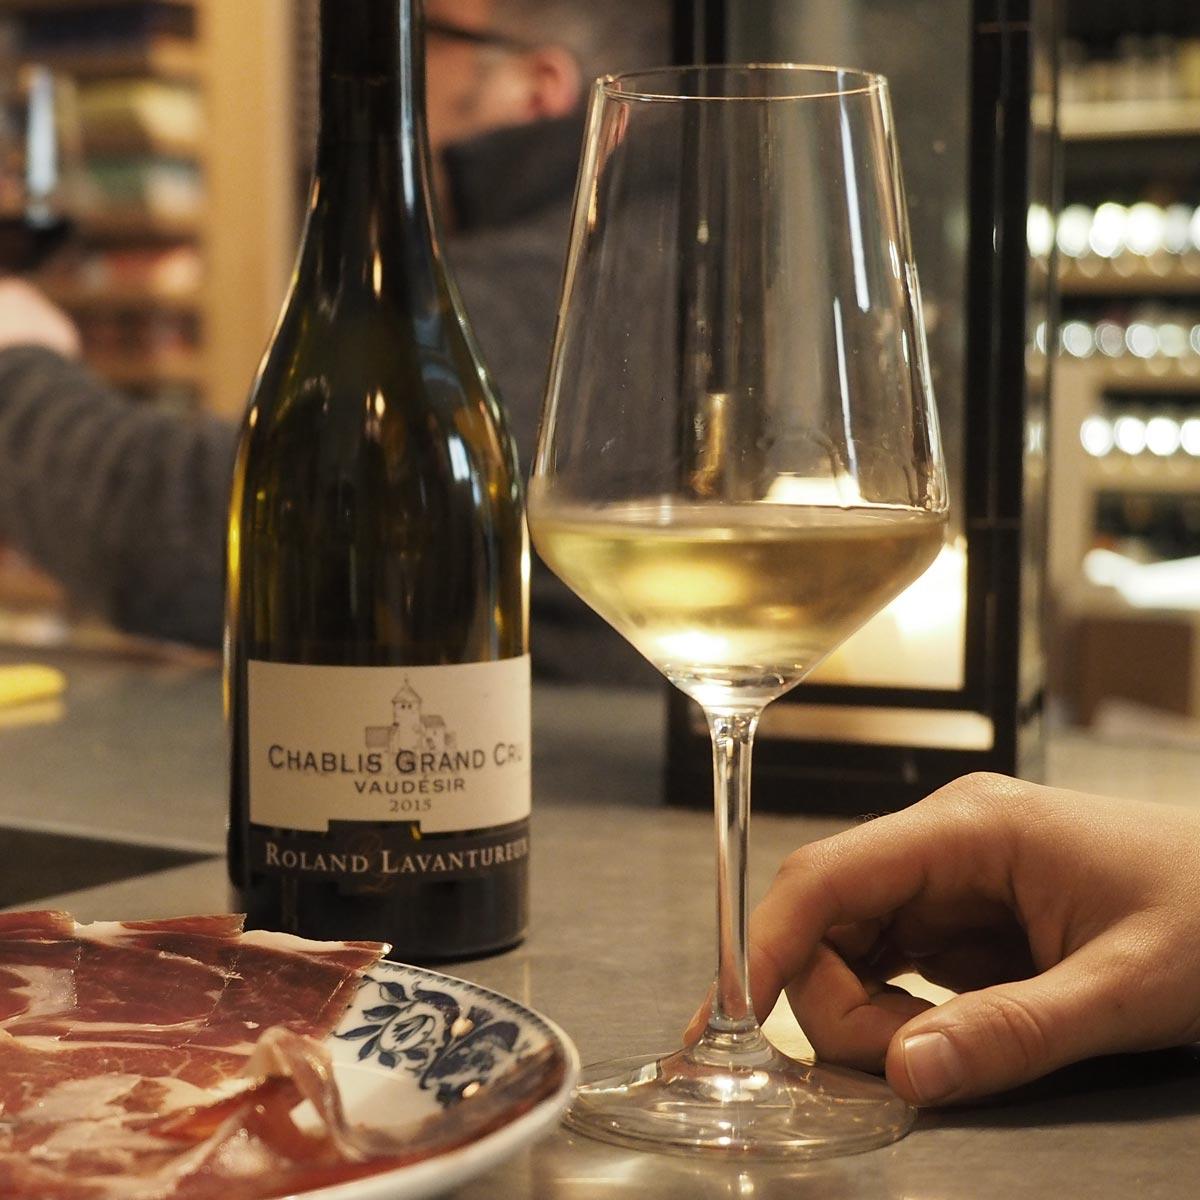 Enoteca al Risanamento vini bianchi